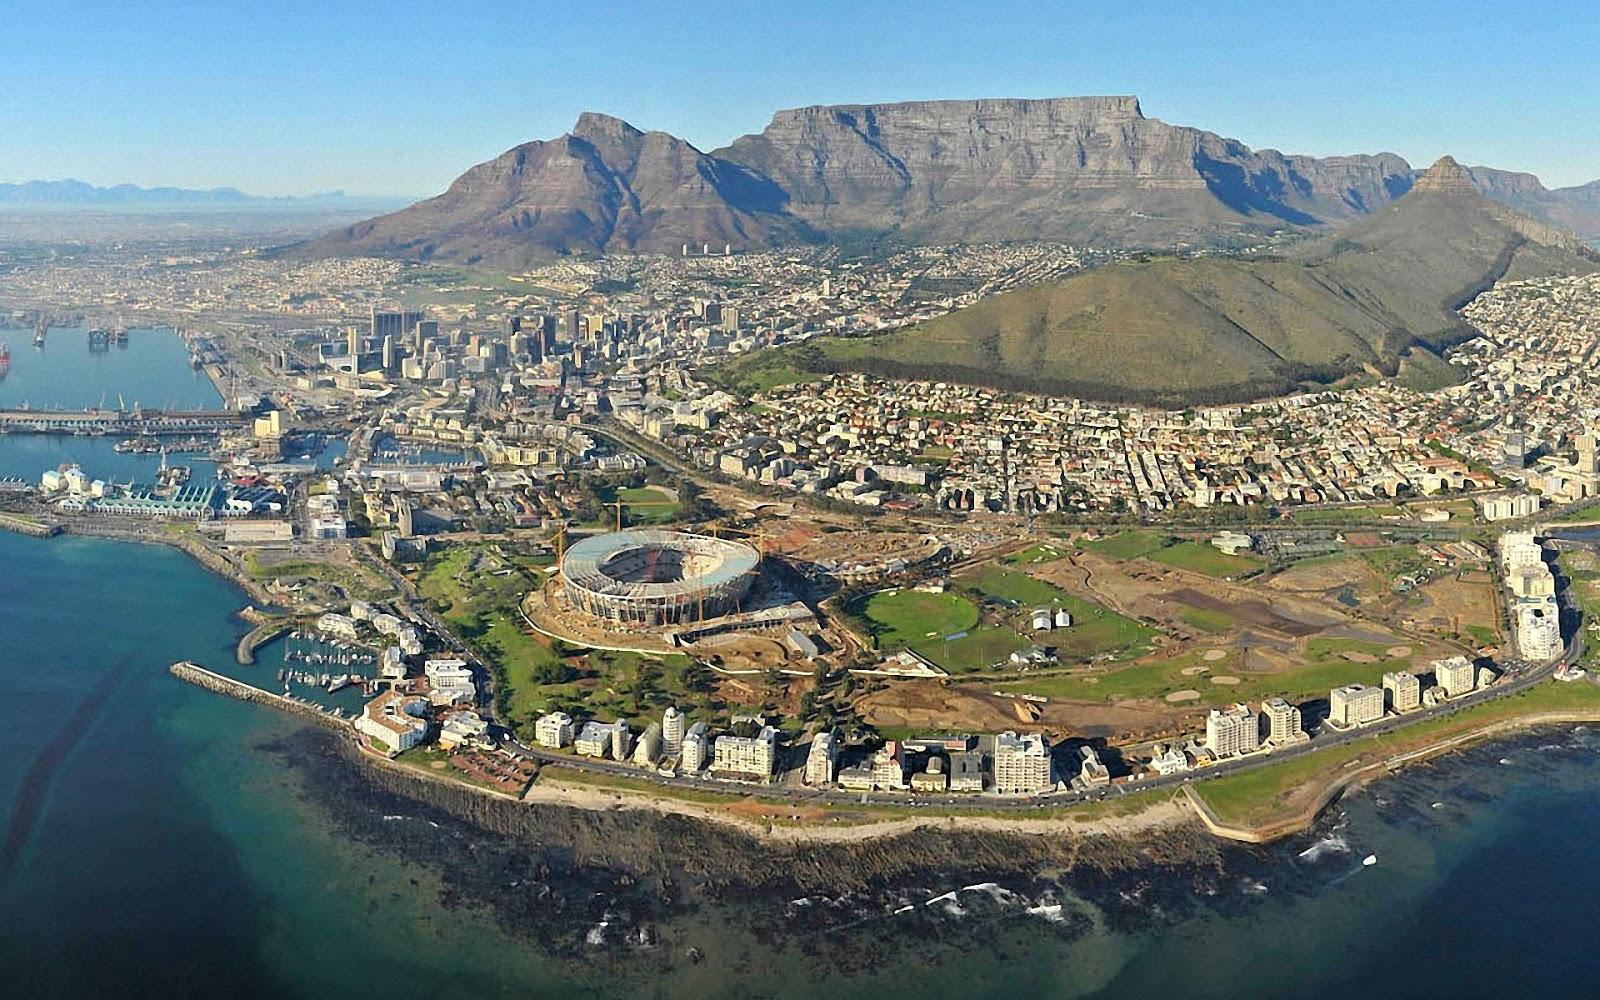 Cape Town City Wallpaper: World Travel Places: Beautiful City Cape Town